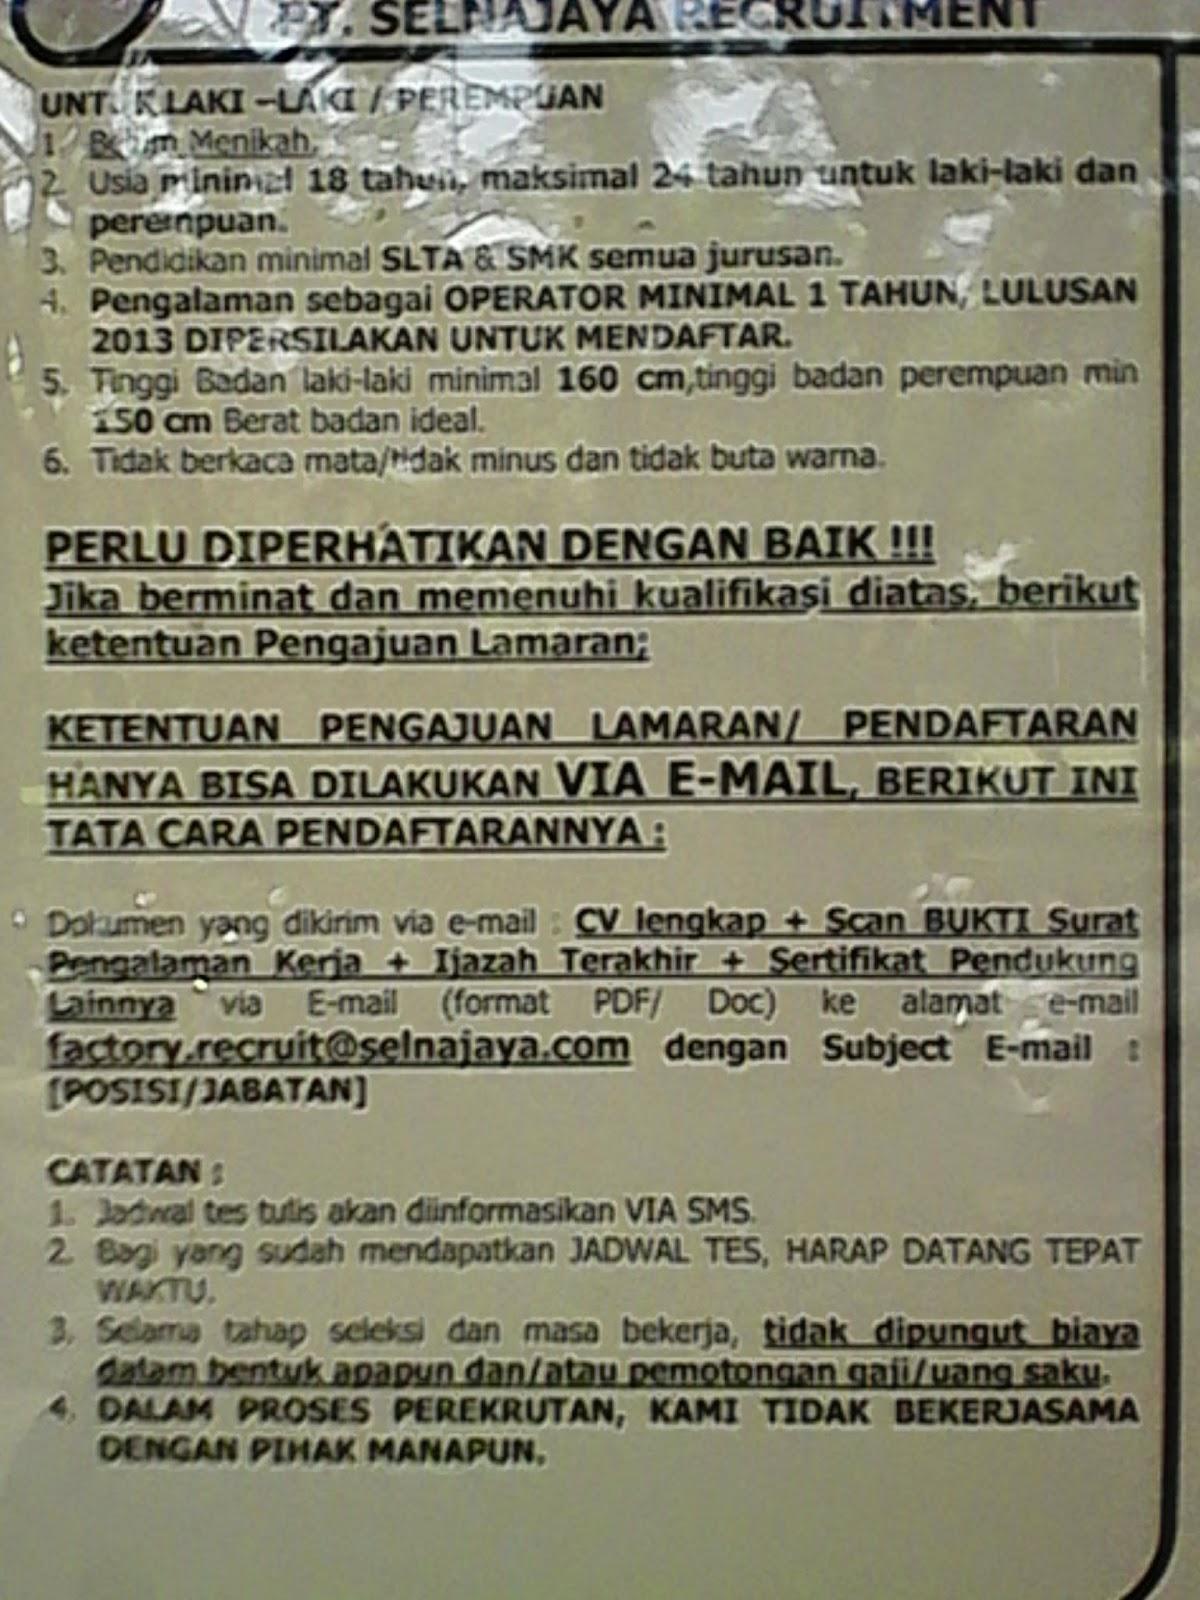 "<img src=""Image URL"" title=""Selna Jaya"" alt=""Selna Jaya""/>"